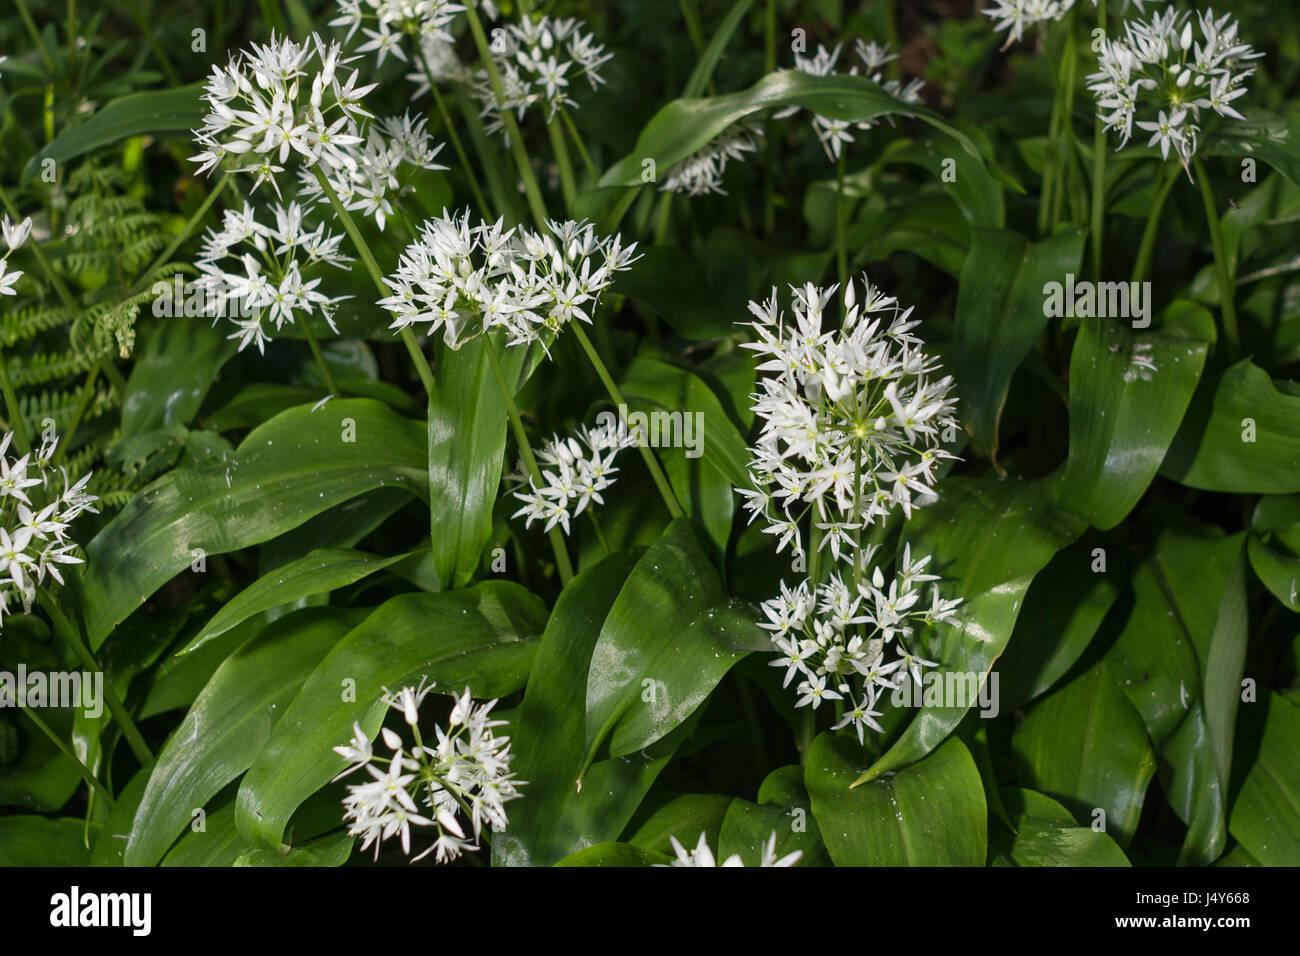 White flowers of the wild garlic called ramsons allium ursinum a white flowers of the wild garlic called ramsons allium ursinum a foraged edible wild green mightylinksfo